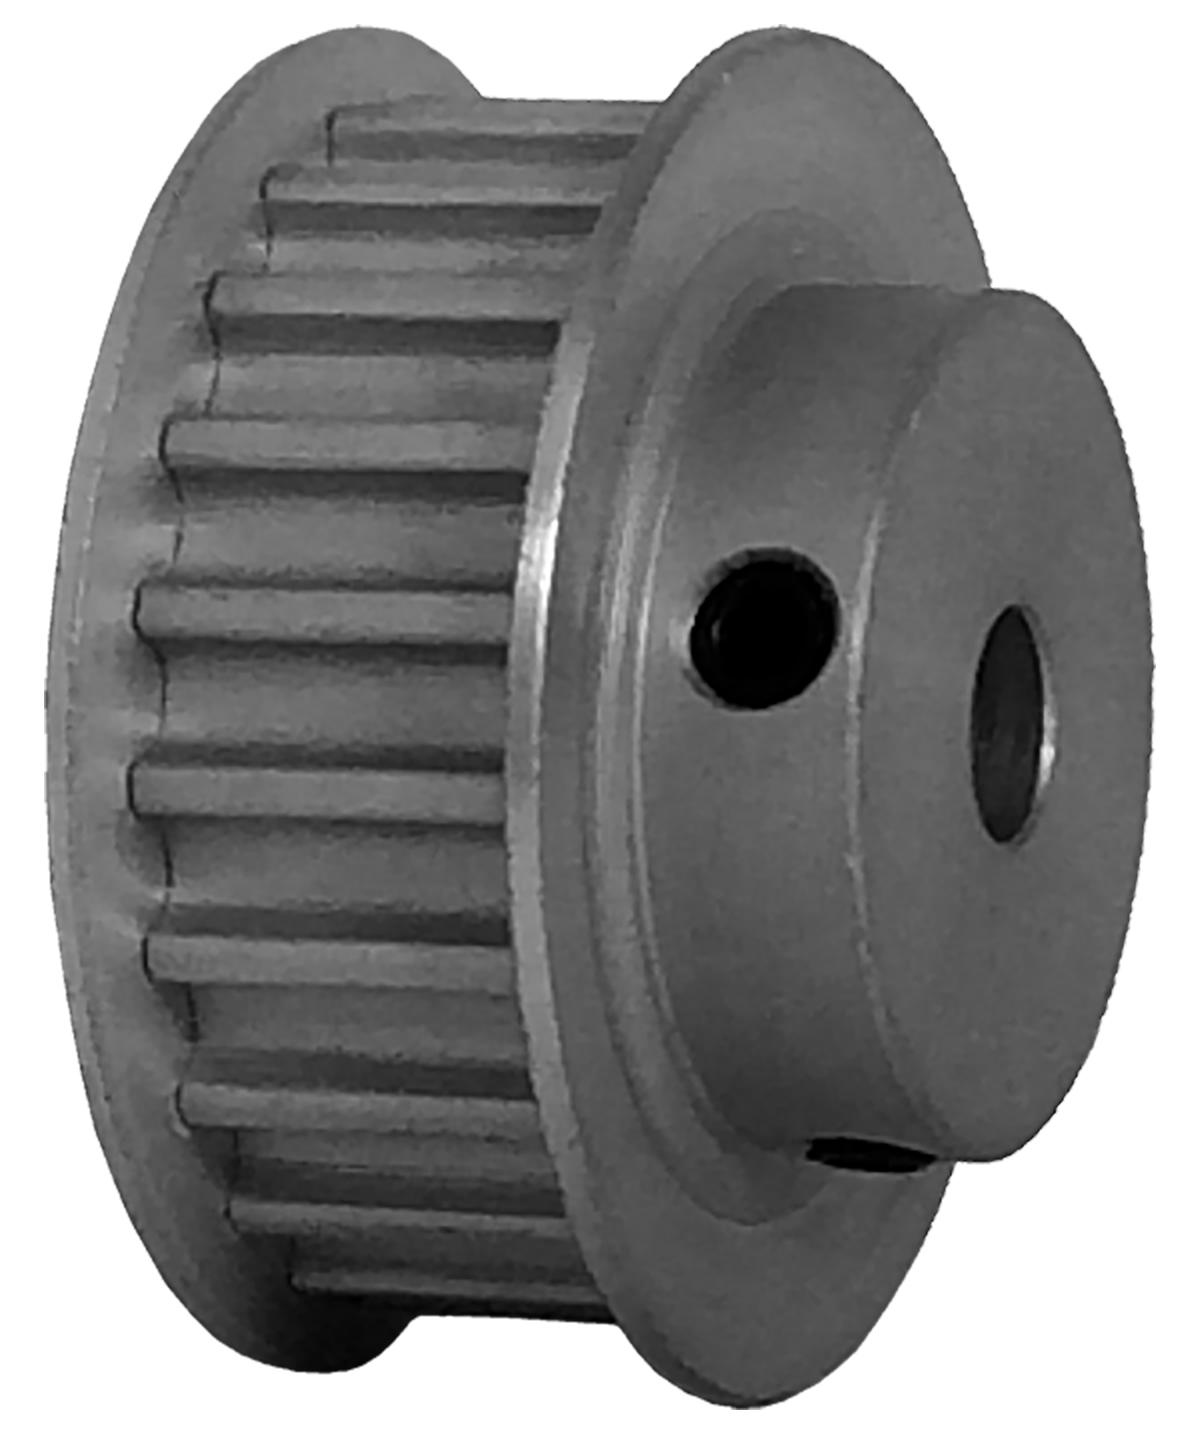 22-5M09-6FA3 - Aluminum Powerhouse®HTD® Pulleys